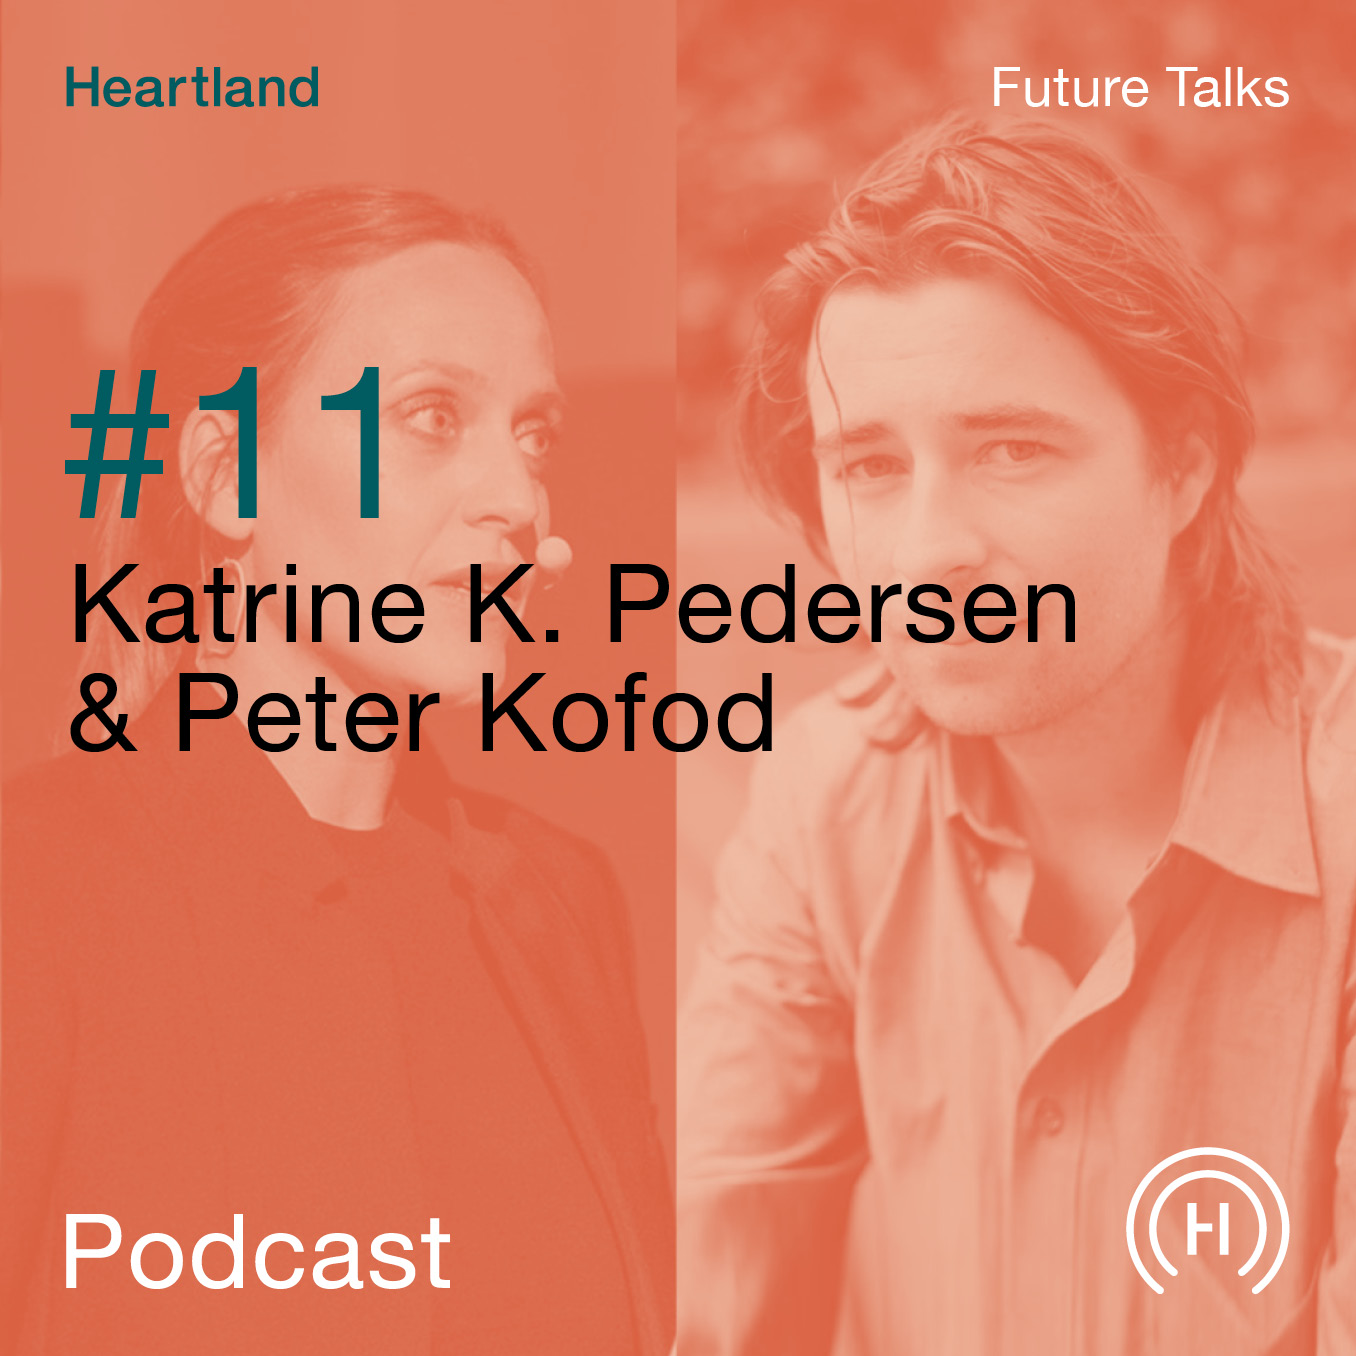 Heartland_New2018_Podcast#11.jpg